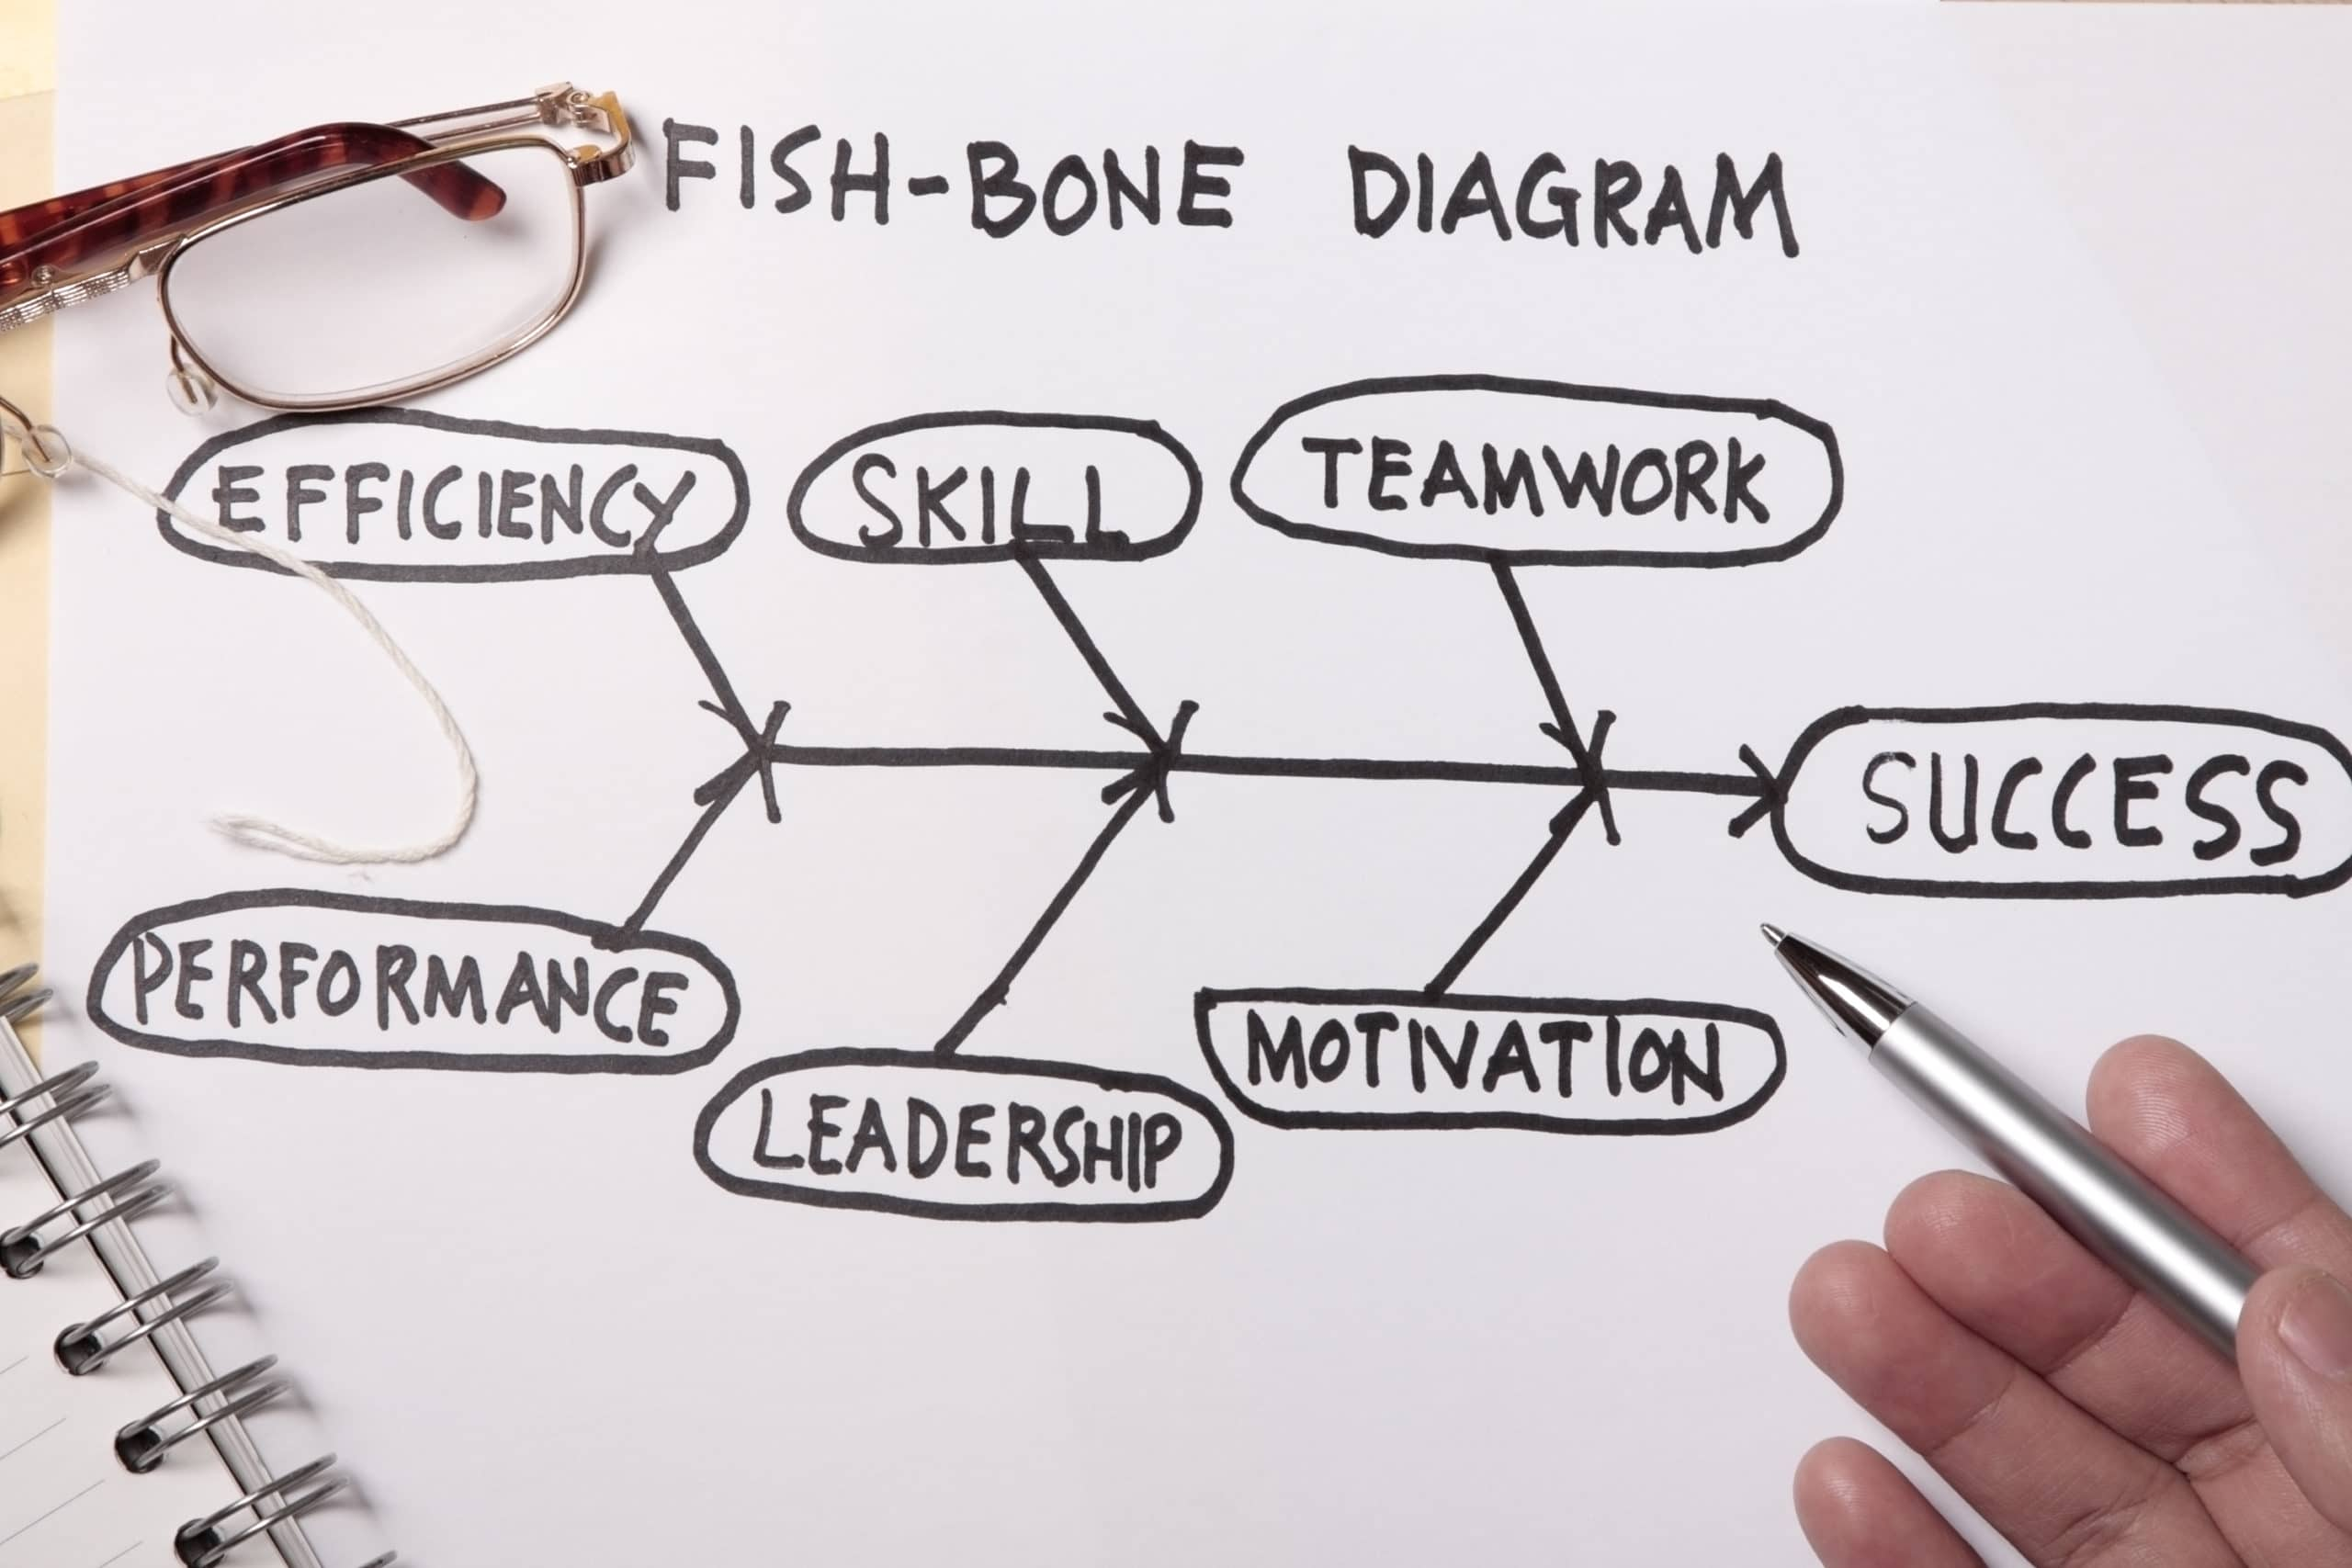 Fish Bone Diagramm